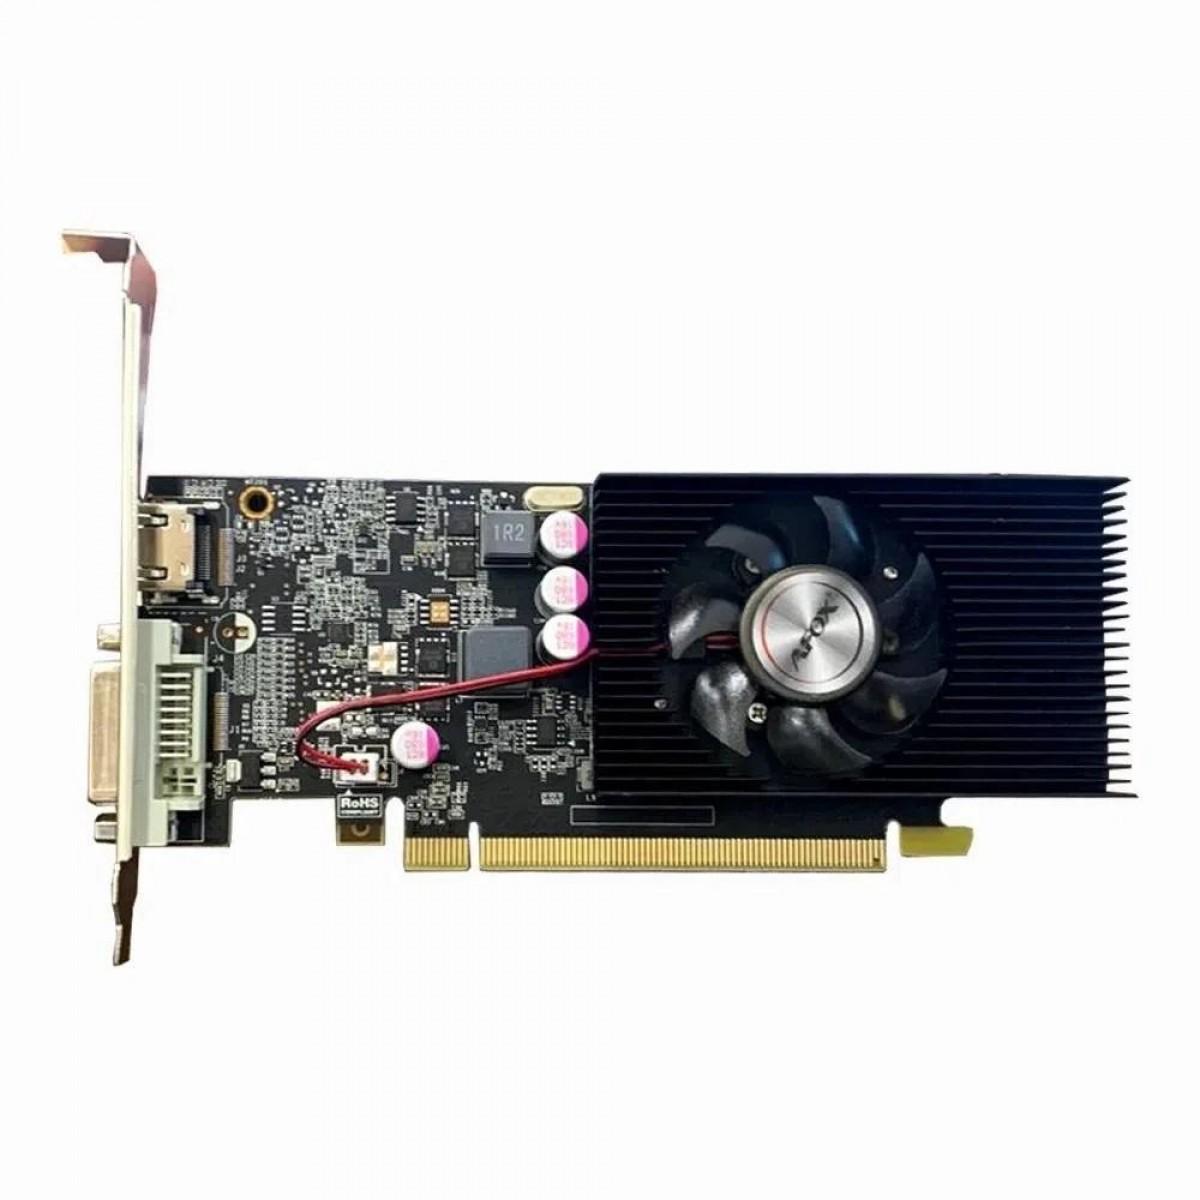 Placa de Vídeo Afox GeForce GT 1030, 2GB, GDDR5, 64bit, AF1030-2048D5L5